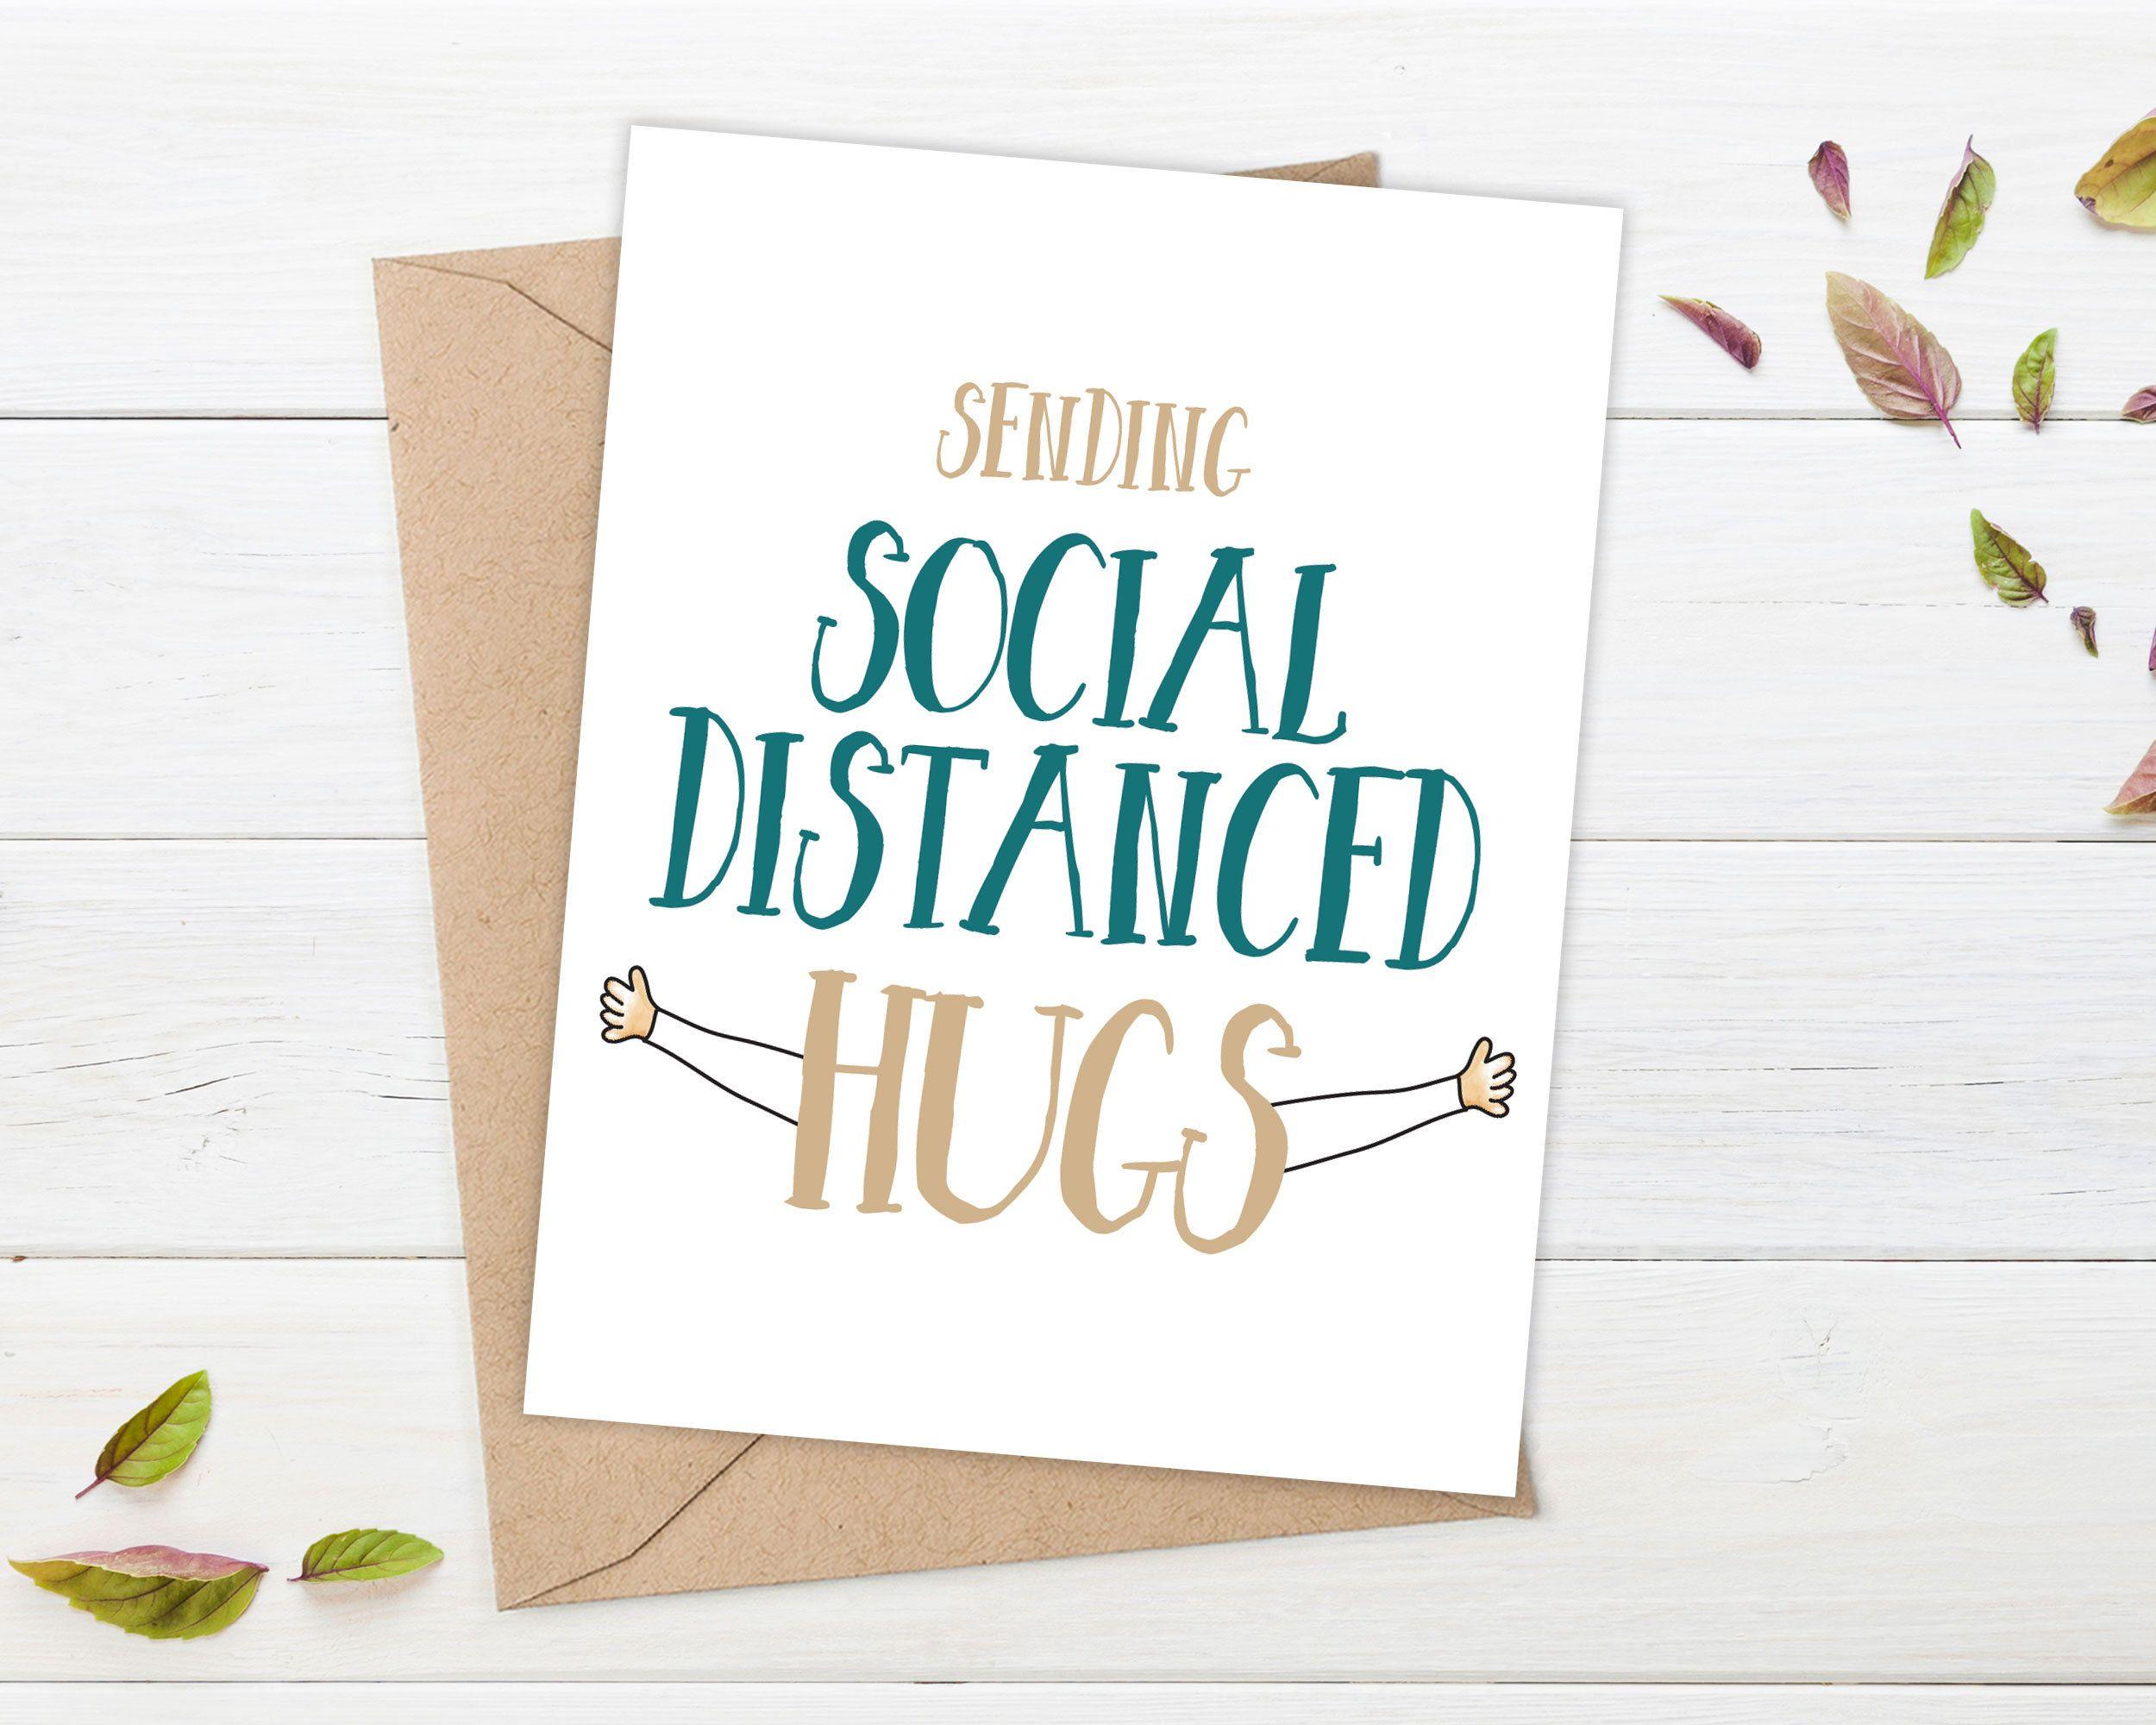 Social Distancing Card Socially Distanced Hug Social Distance Miss You Card Encouragement Social In 2020 Miss You Cards Cards For Boyfriend Engagement Cards Funny